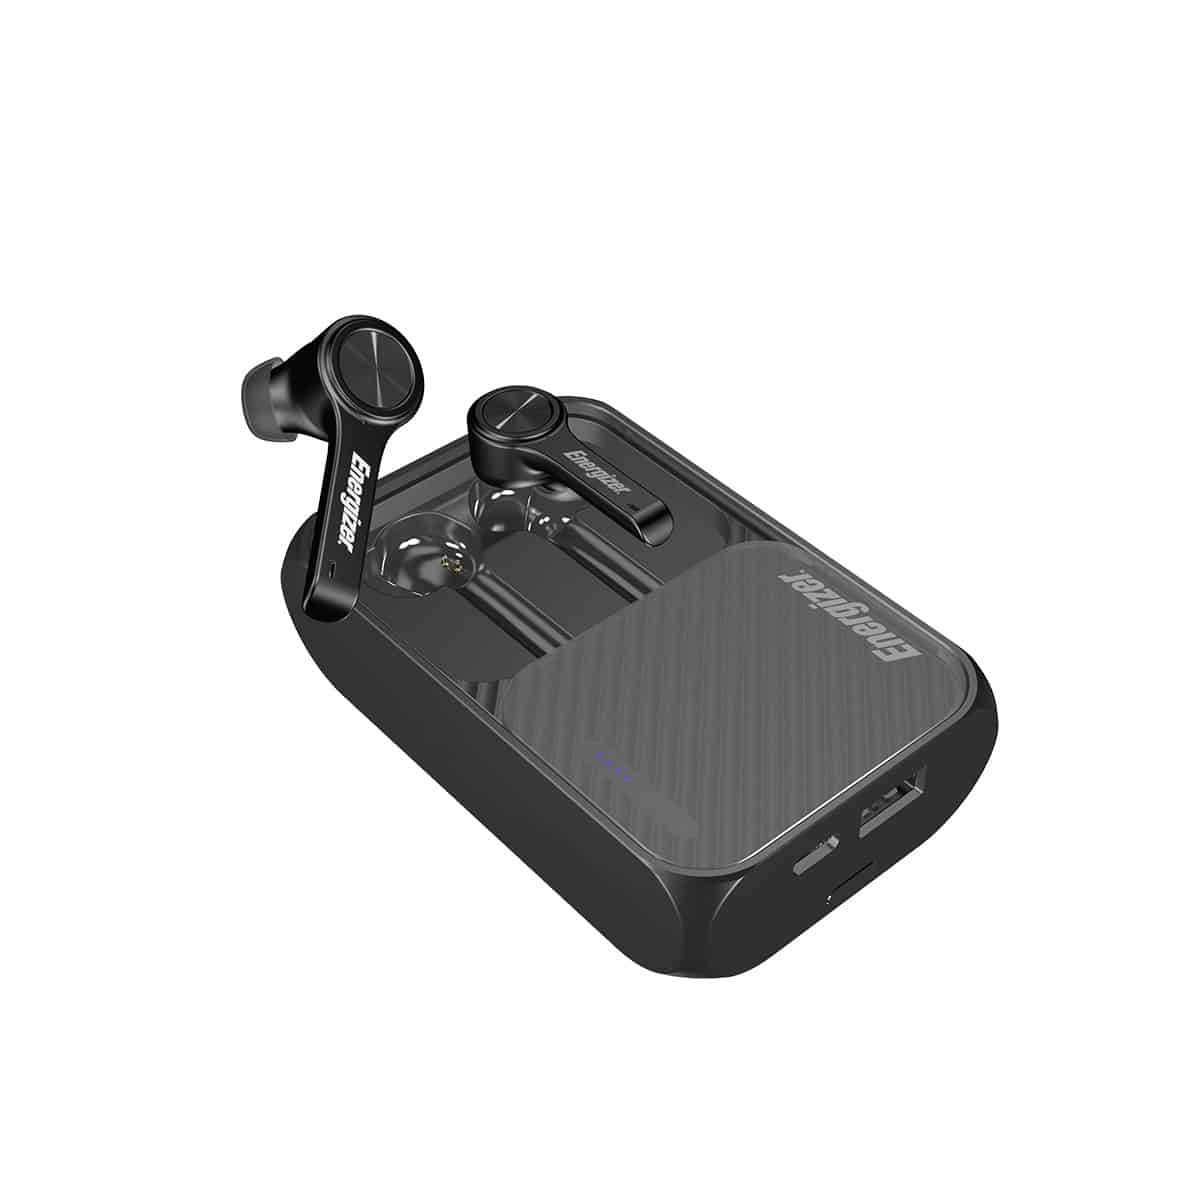 UB5001 - Tai nghe True Wireless Energizer UB5001